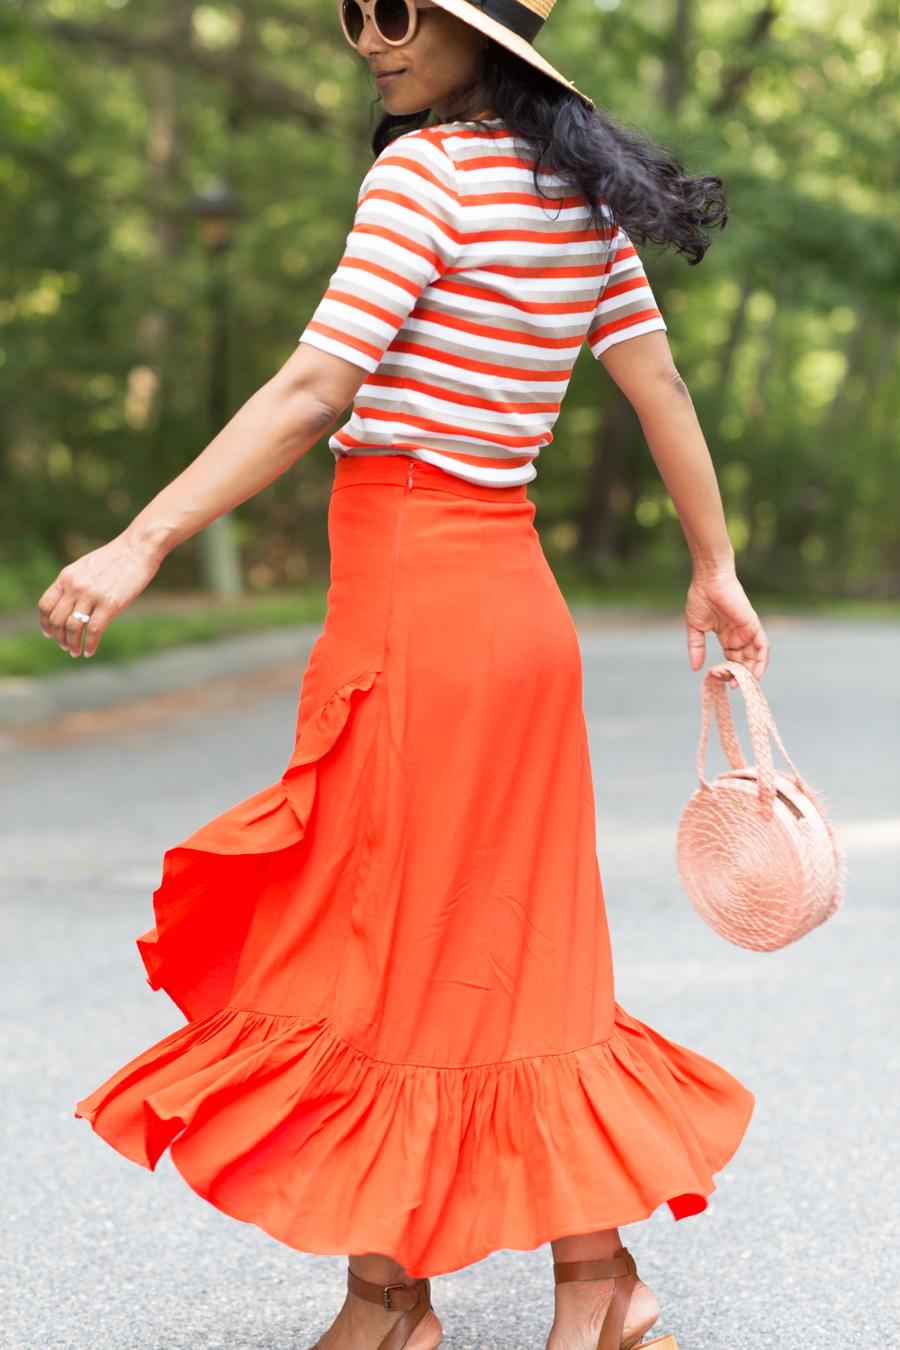 petite fashion, midi skirts, ruffle skirt, flounce skirt, H&M, colorful style, petite womens fashion